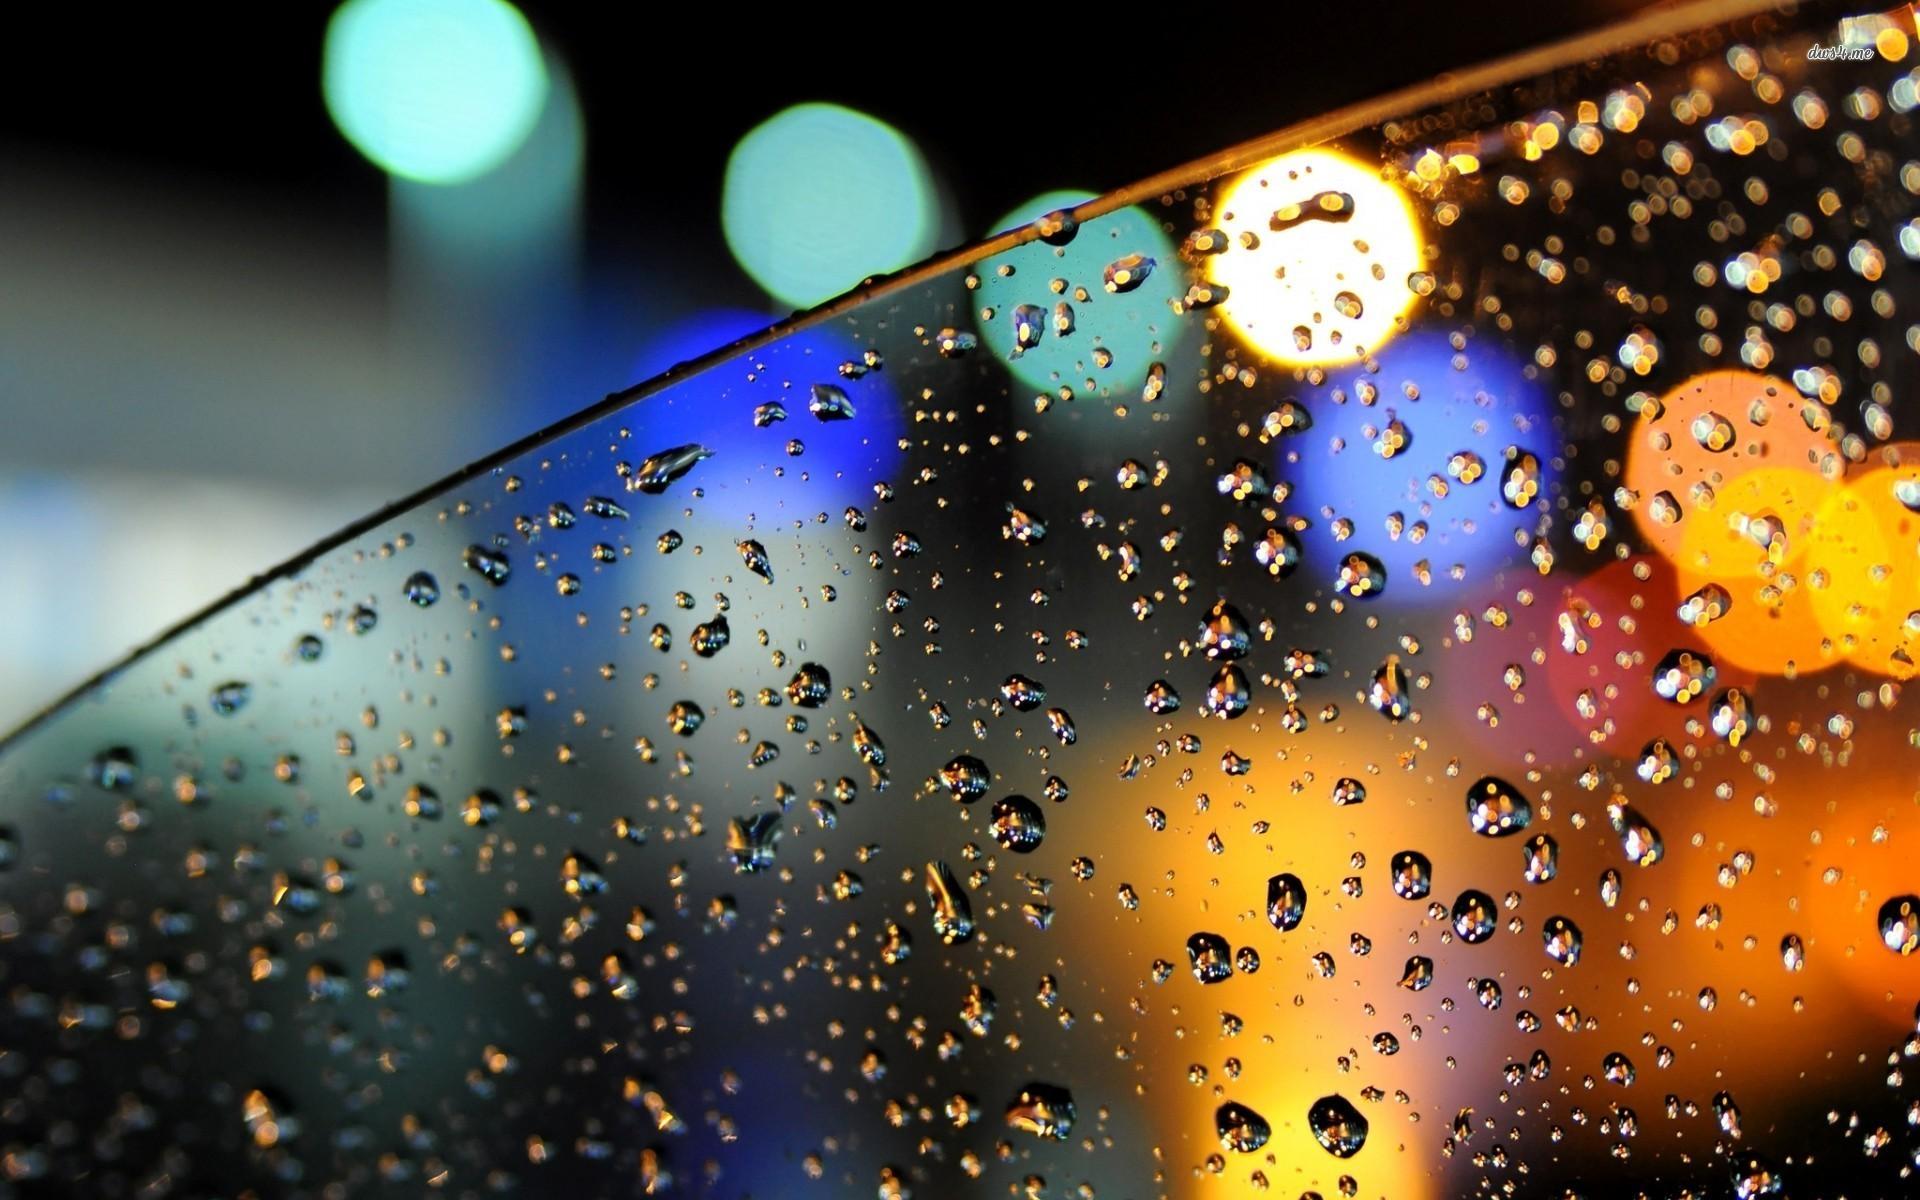 Free Download Rainy Car Window Wallpaper Photography